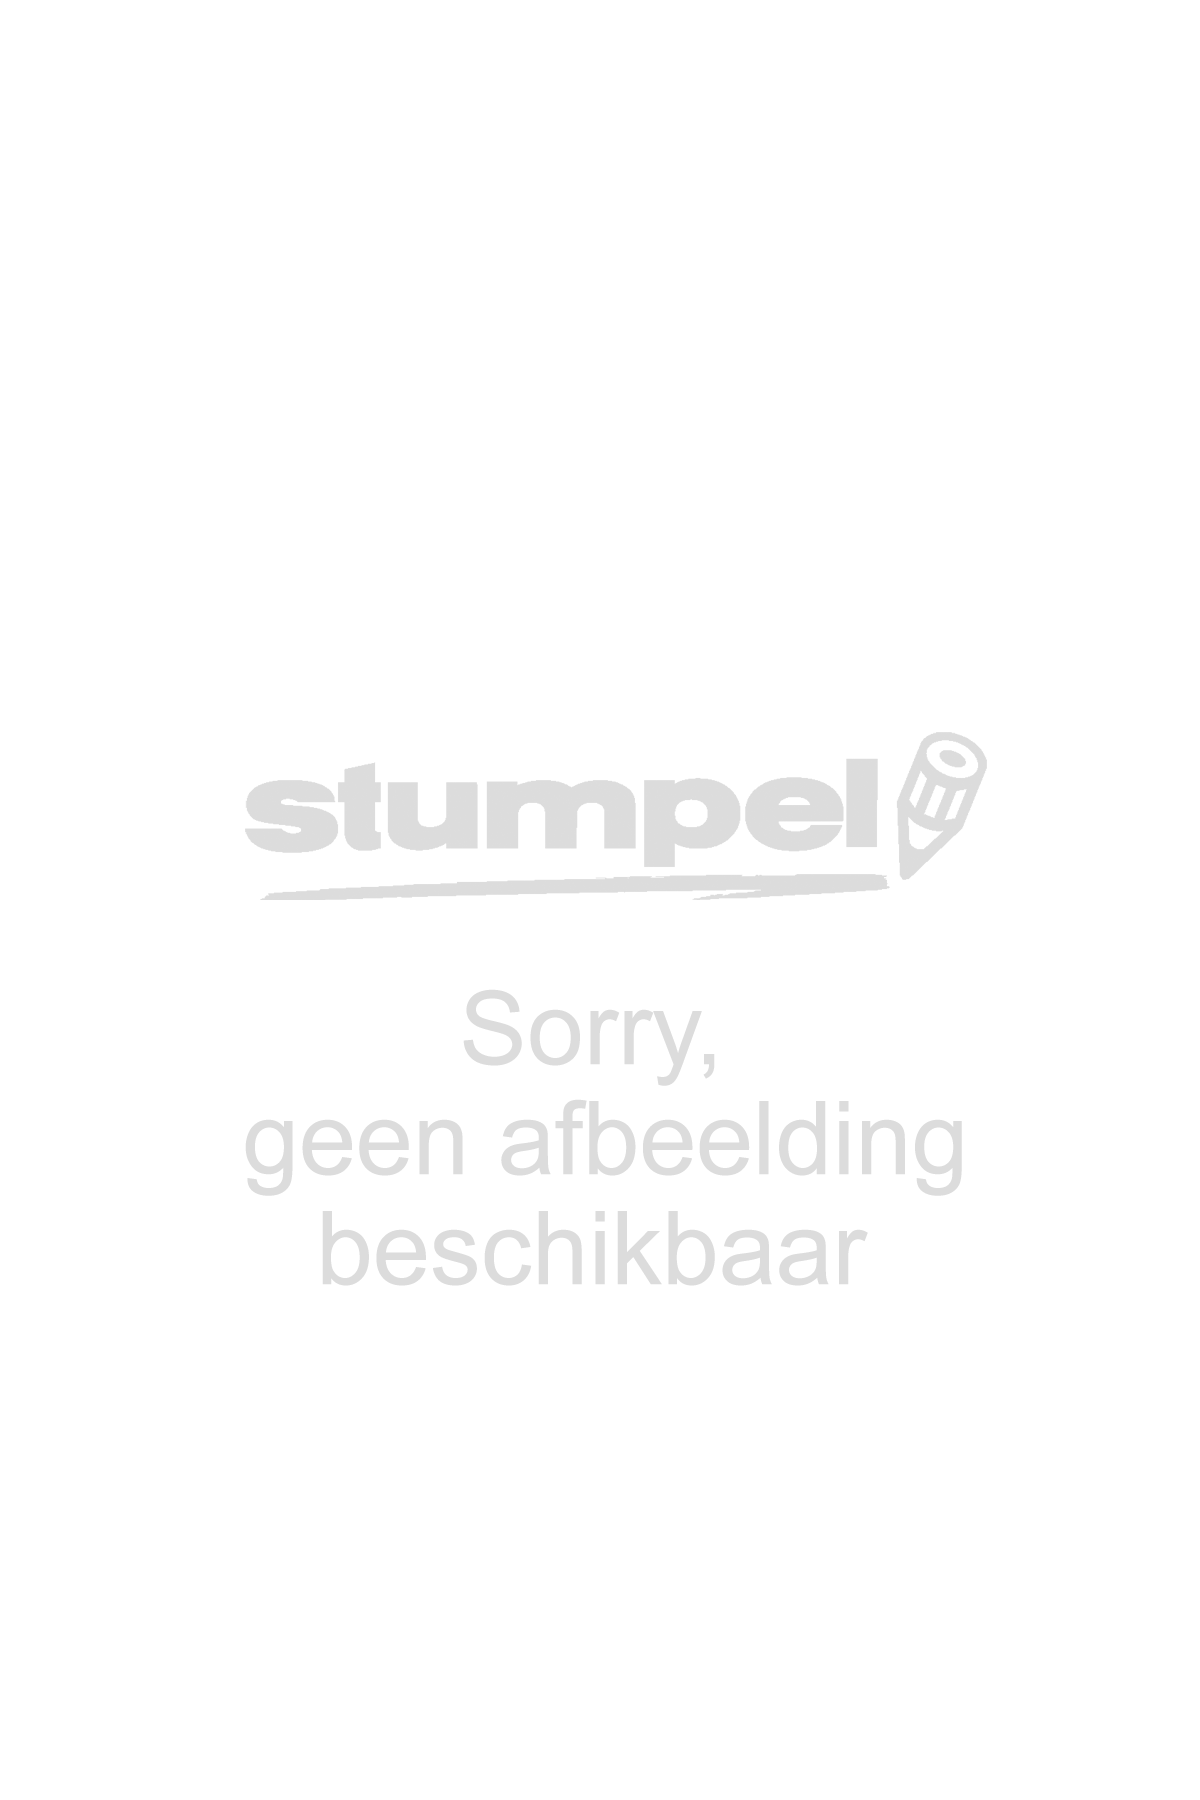 Toetsenbord, Logitech MK330 draadloos